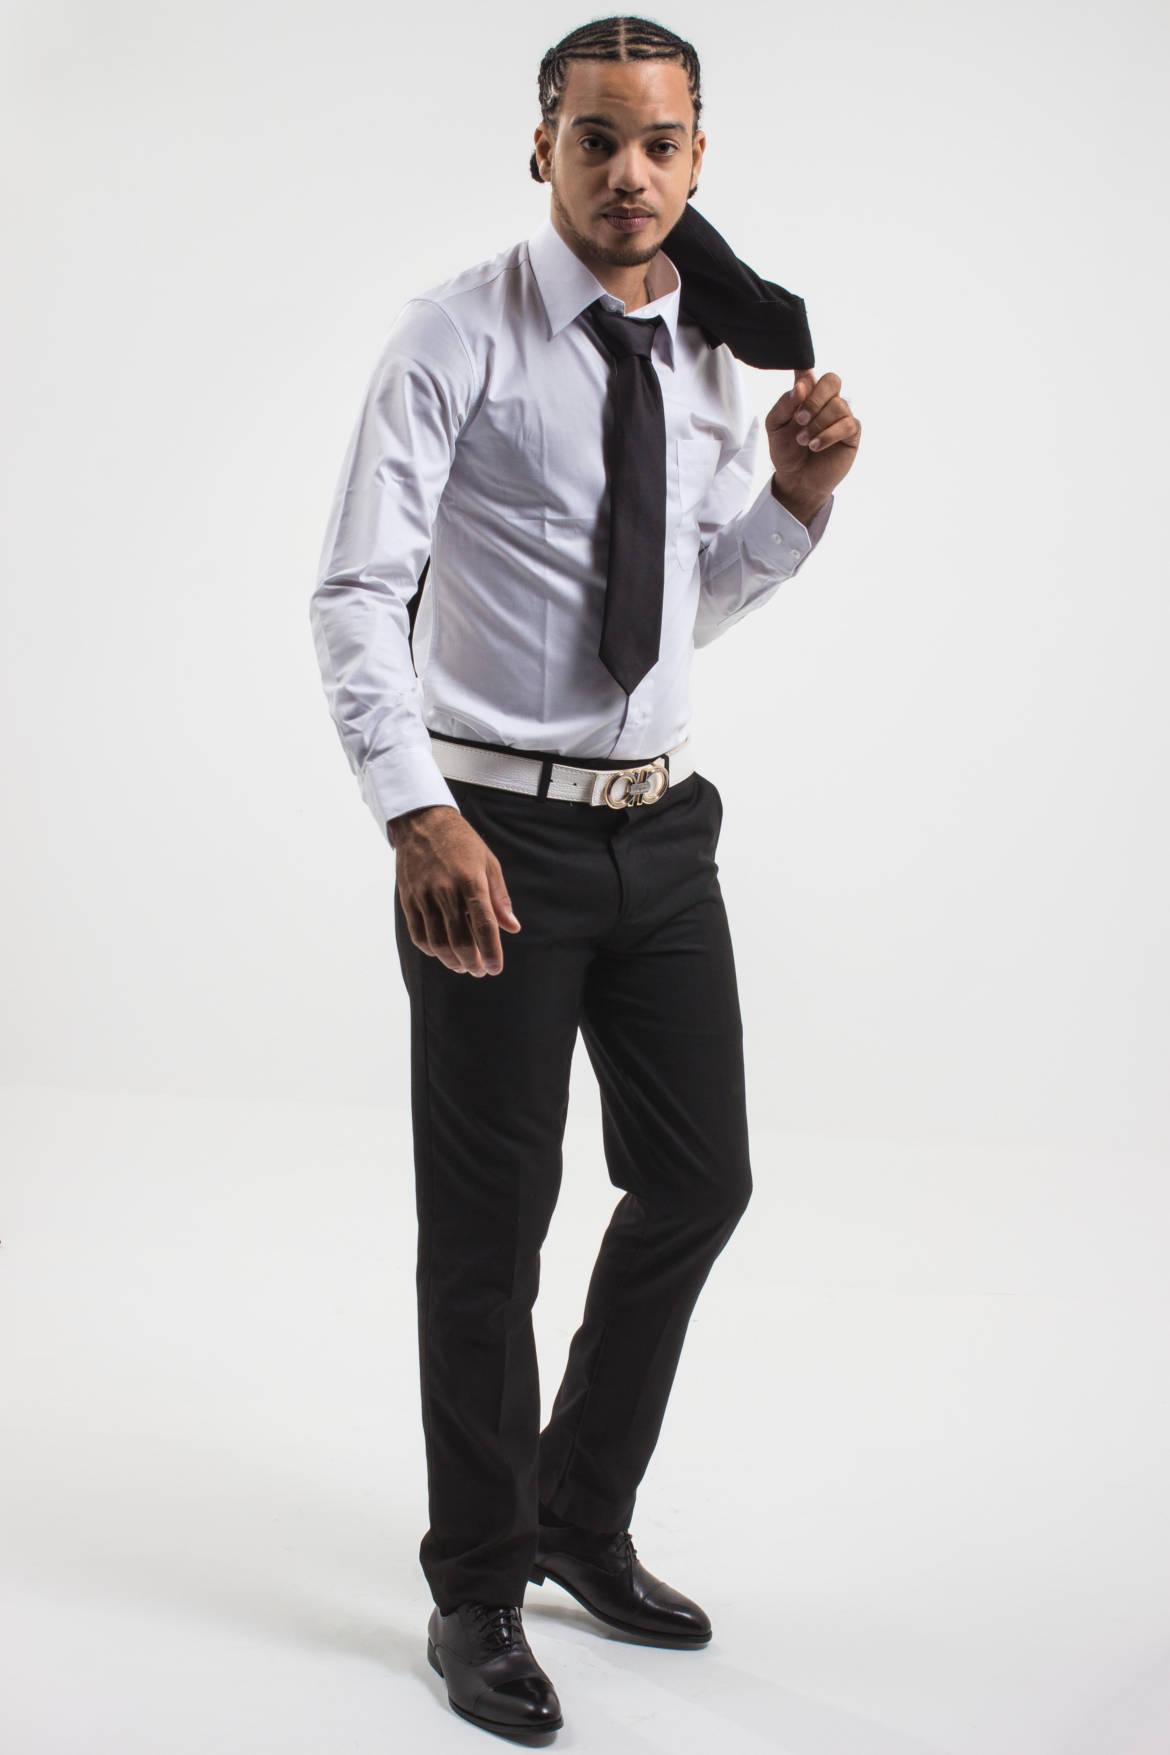 Mikey Bennett Endorses Single by Jameik King